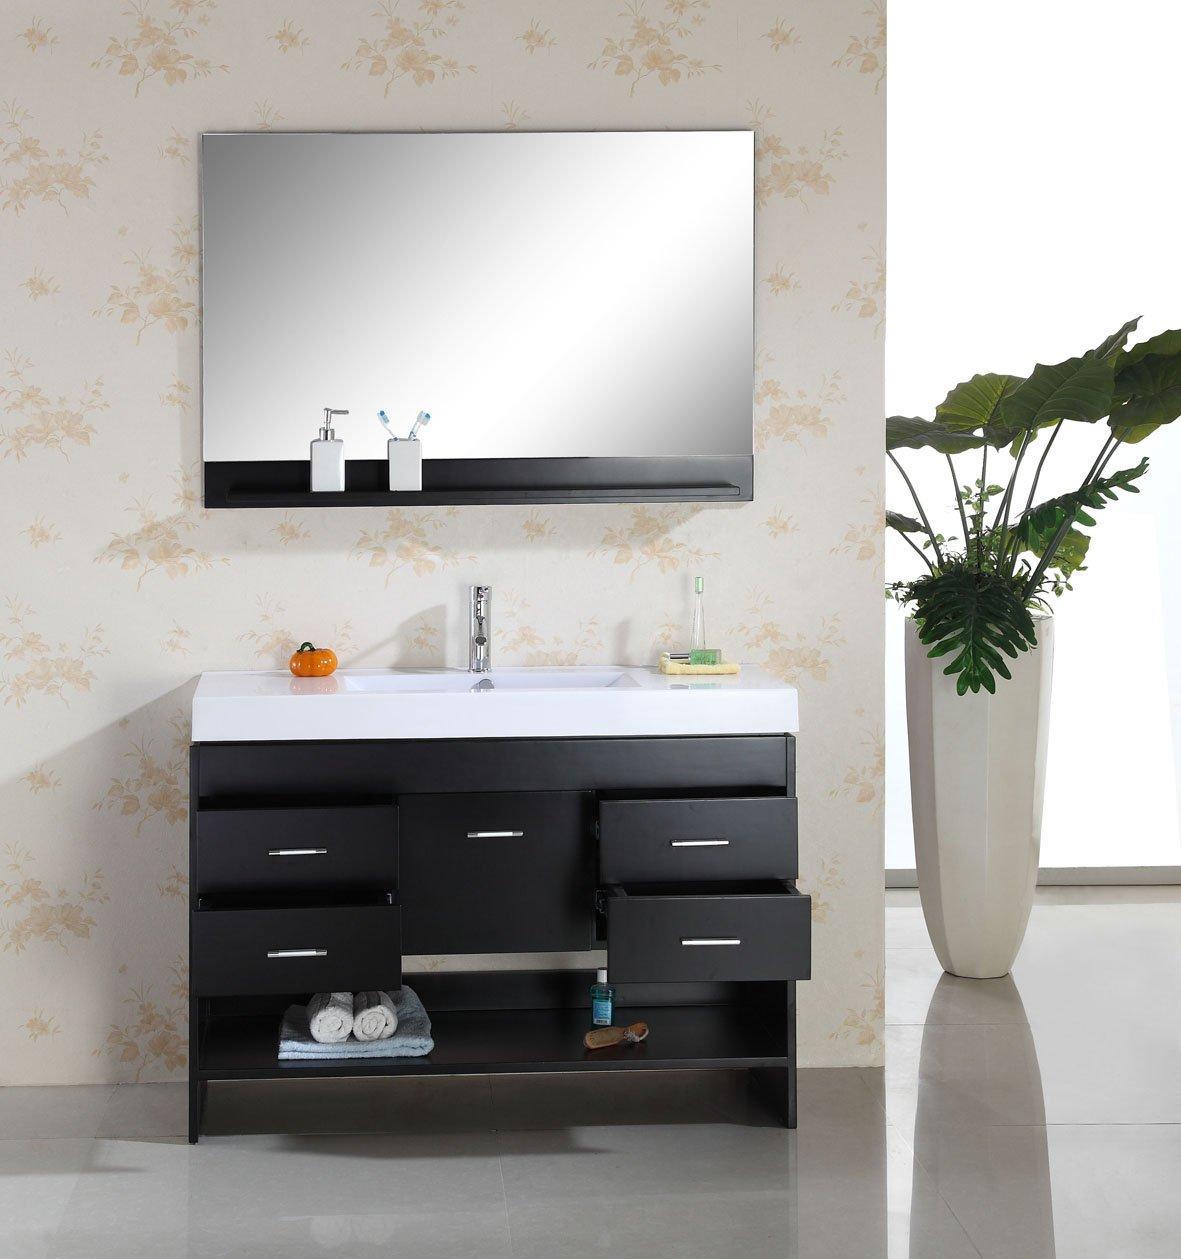 virtu usa ms575ces gloria 48inch single sink bathroom vanity set with shelf ceramic designer basin countertop espresso finish amazoncom